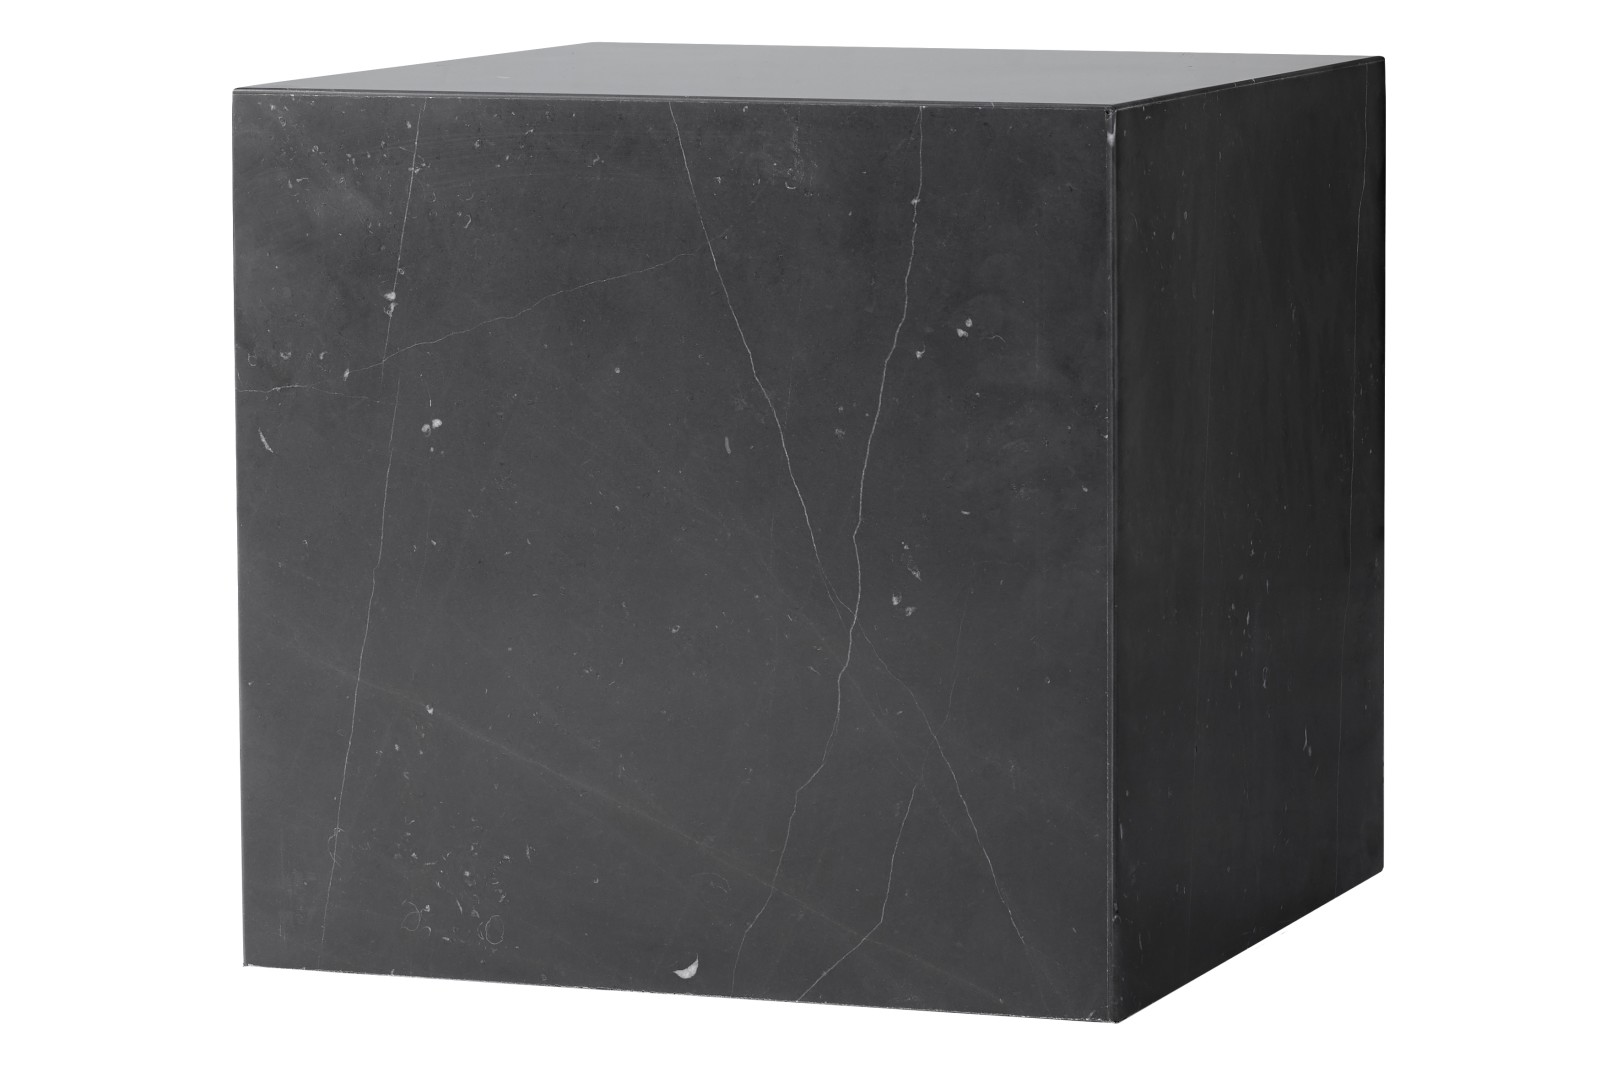 Plinth Cubic Side Table Black Marble